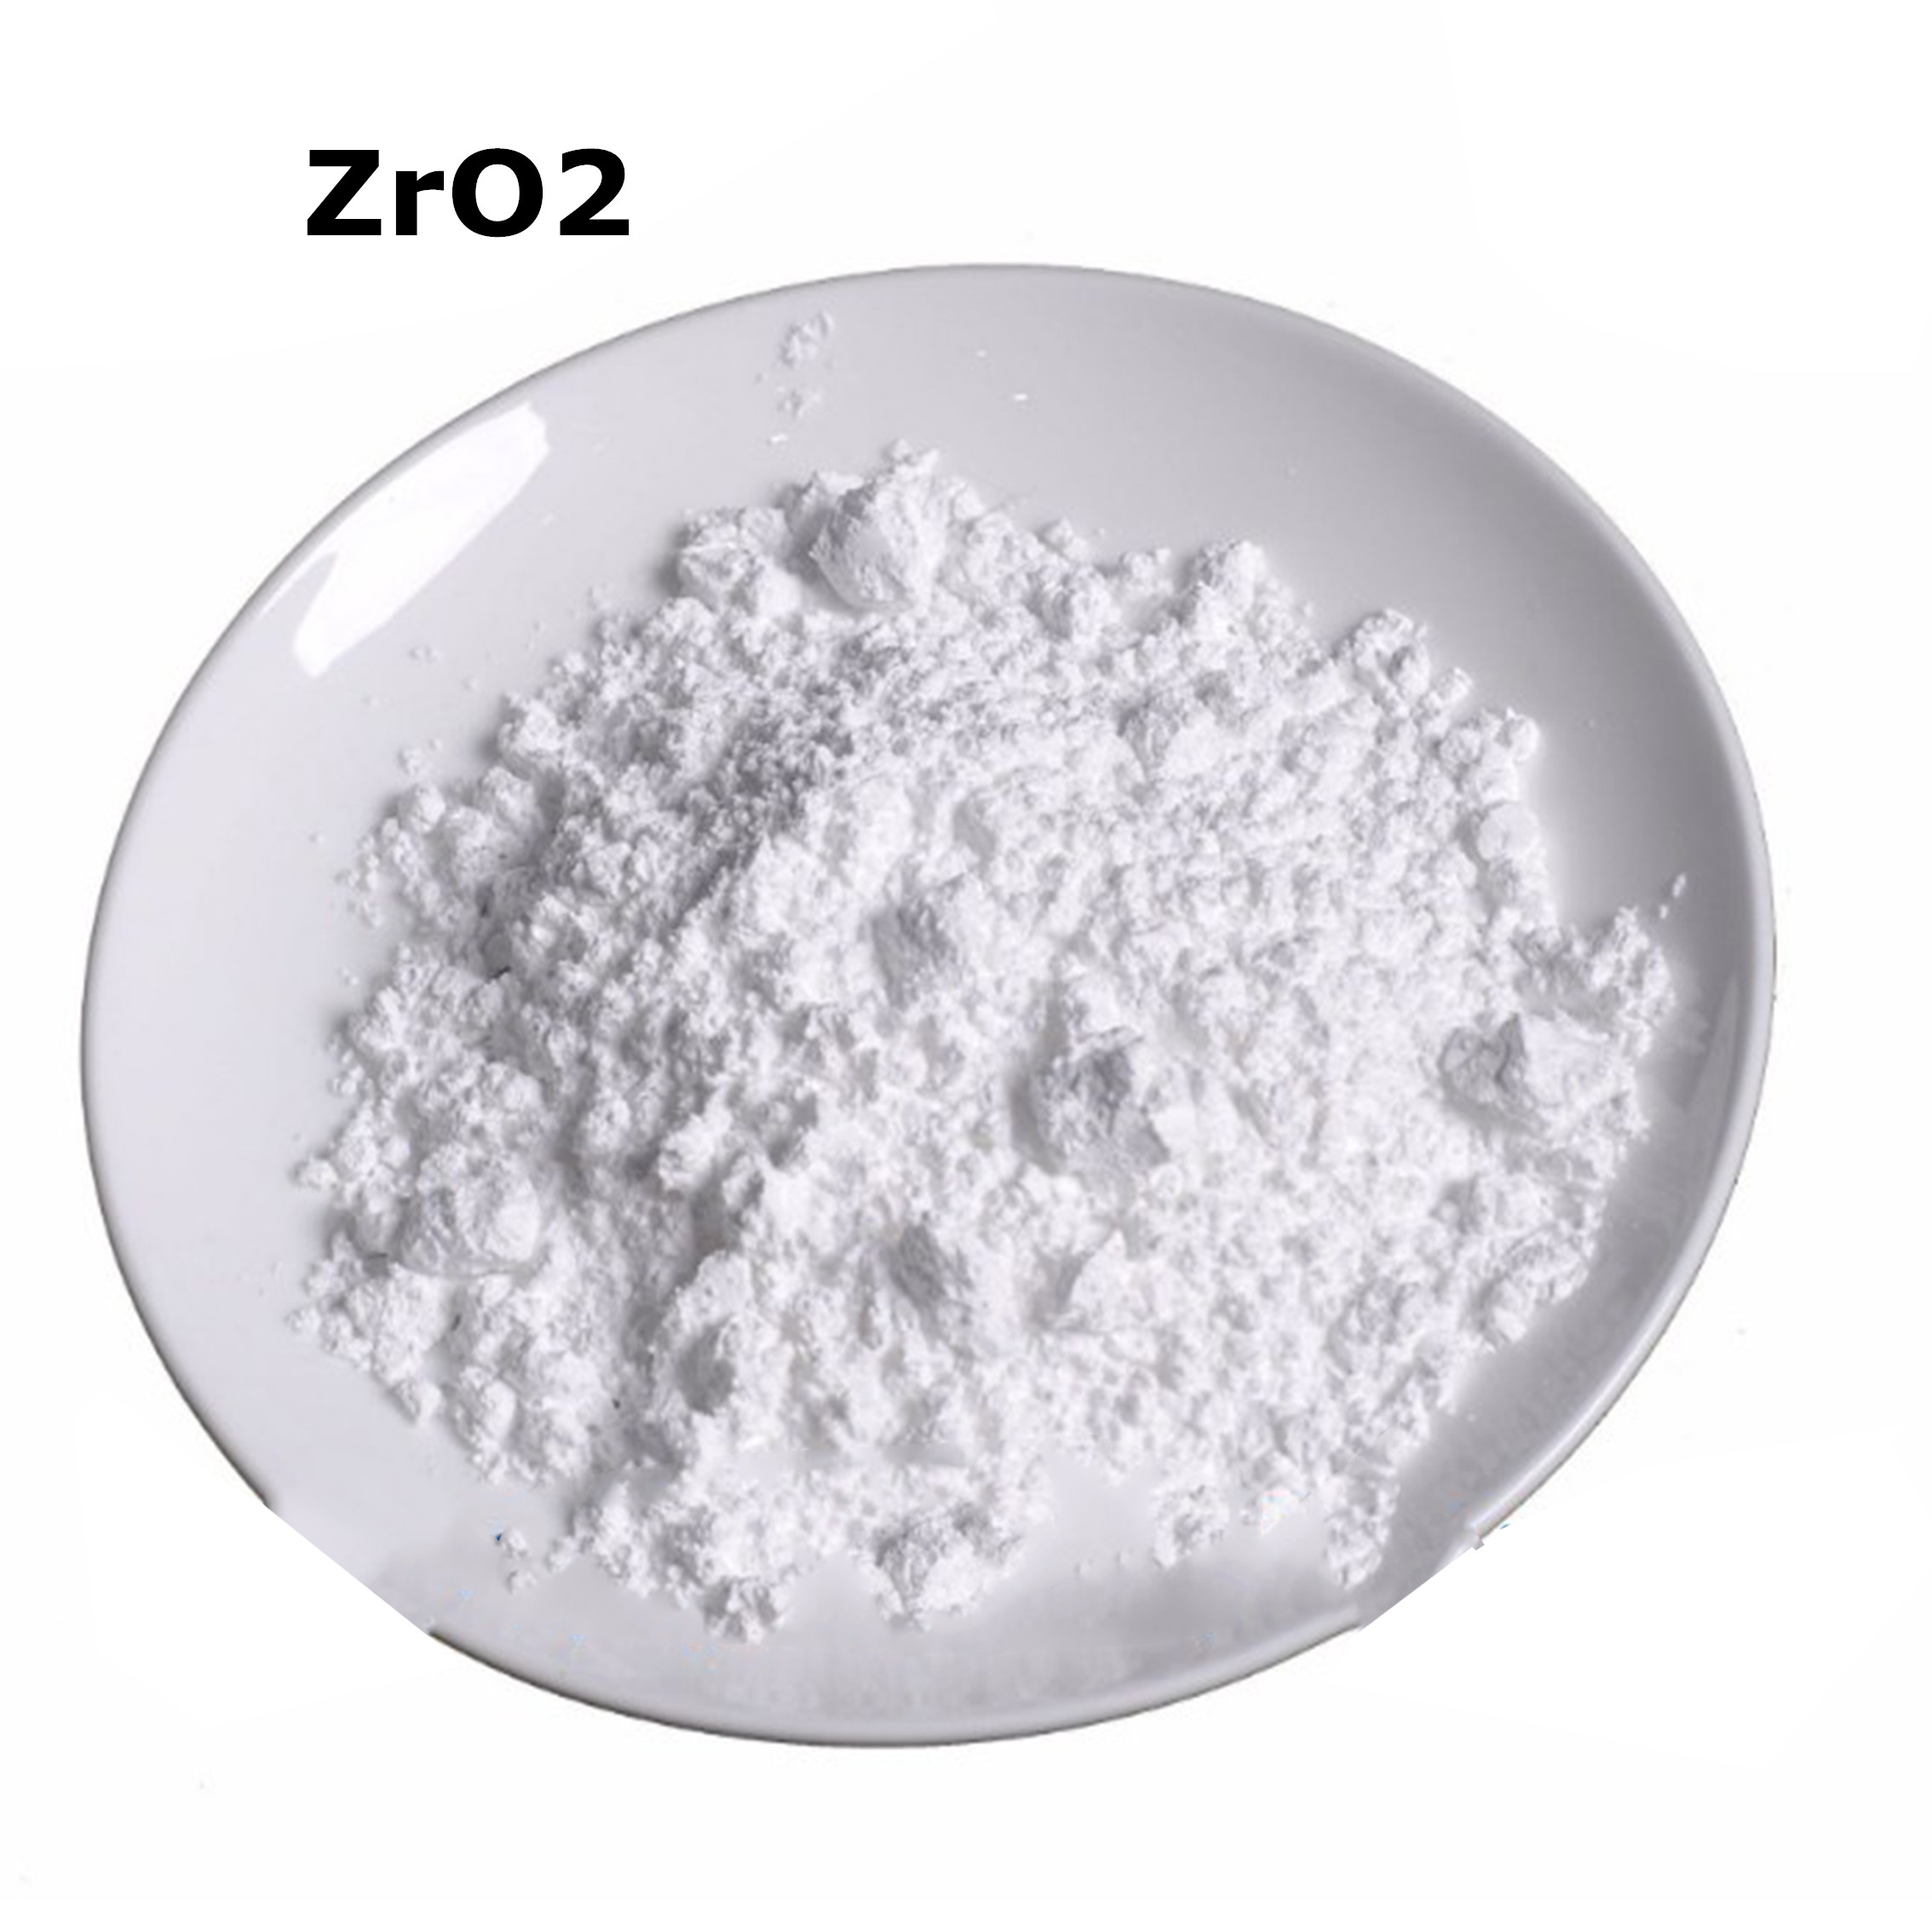 ZrO2 High Purity Powder 99.9% Zirconium Oxide For R&D Ultrafine Nano Powders About 1 Micro Meter